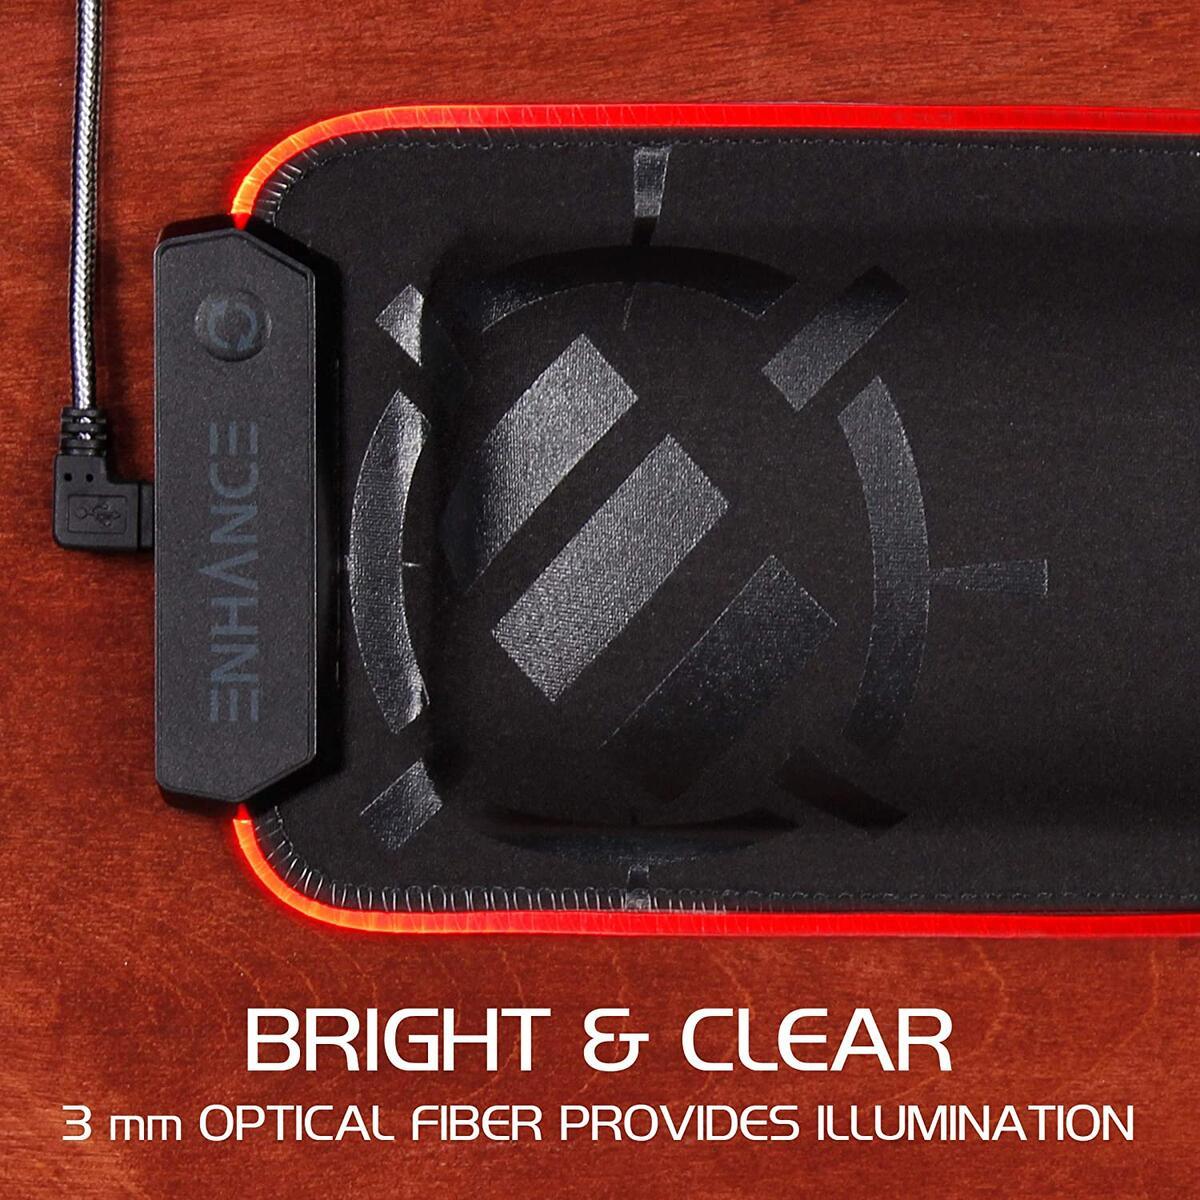 ENHANCE LED Gaming Keyboard Wrist Rest Pad